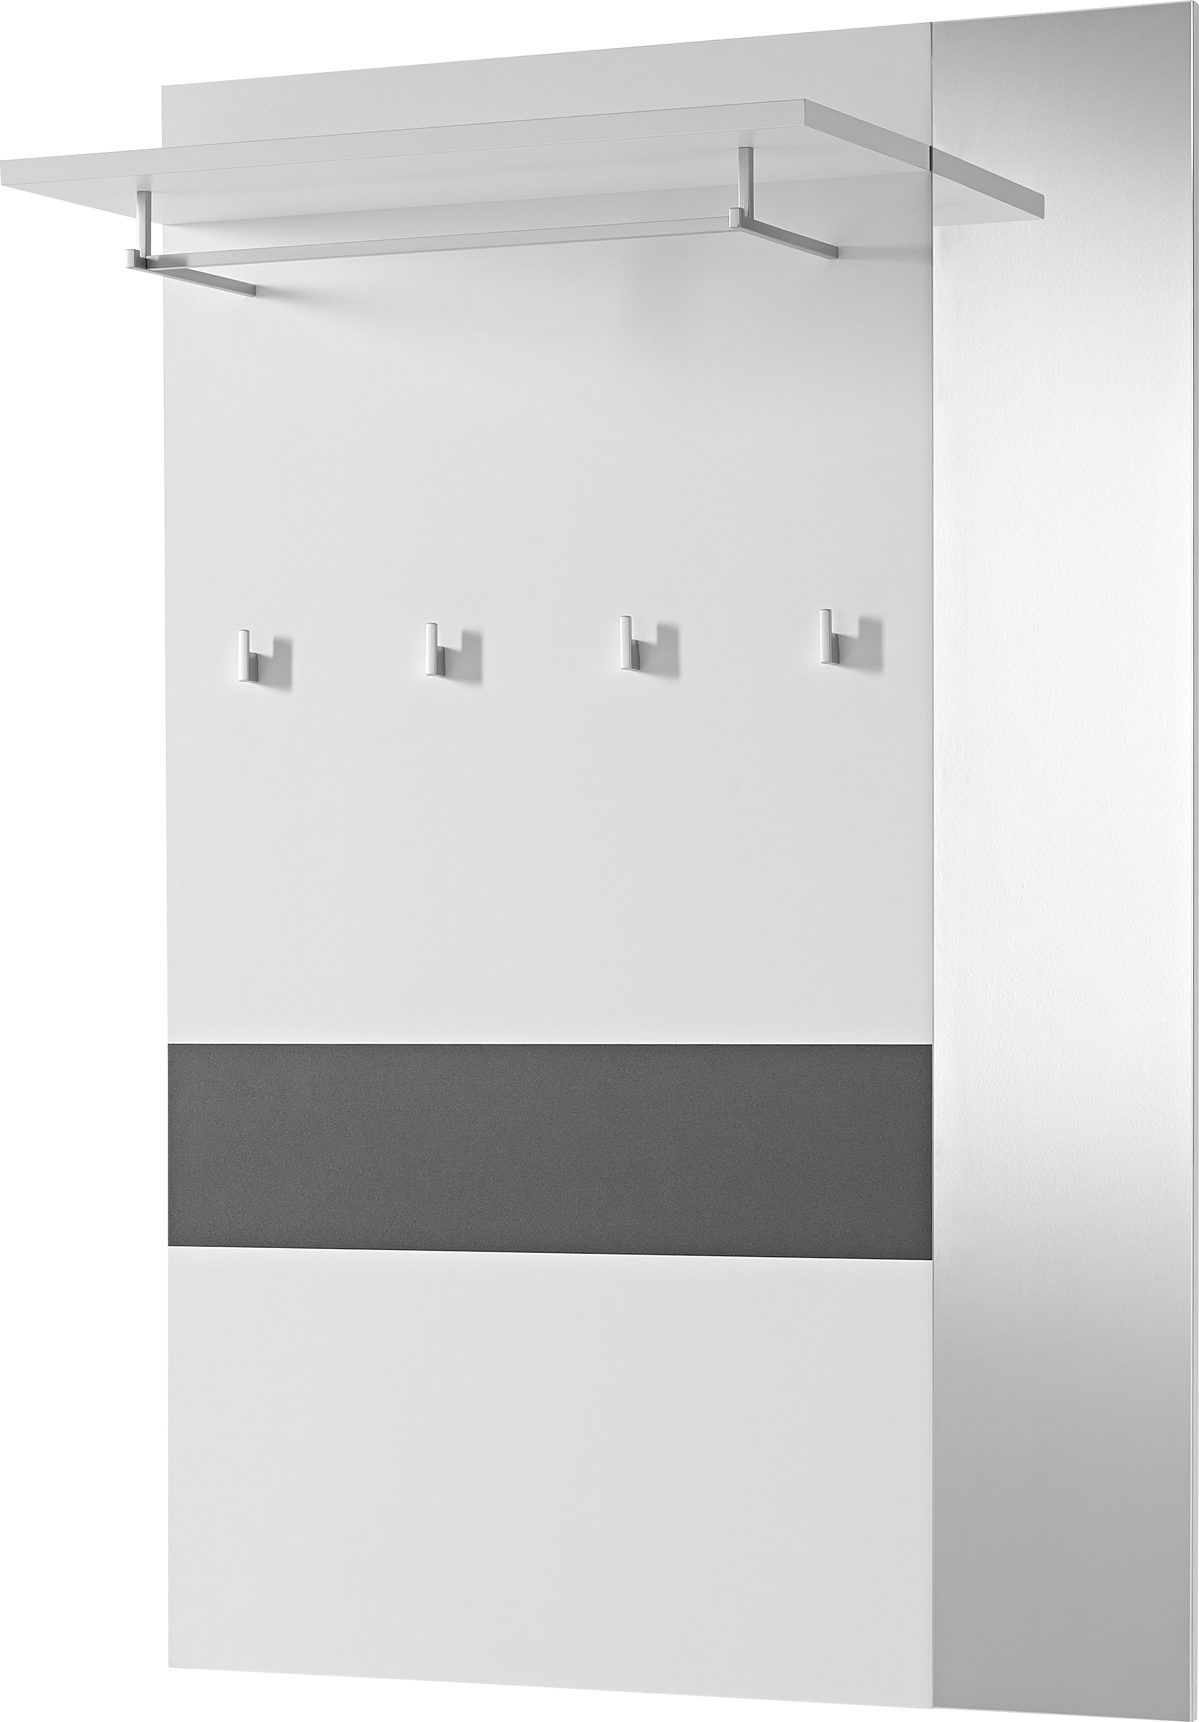 Neu Farbgestaltung Flur Diele Design